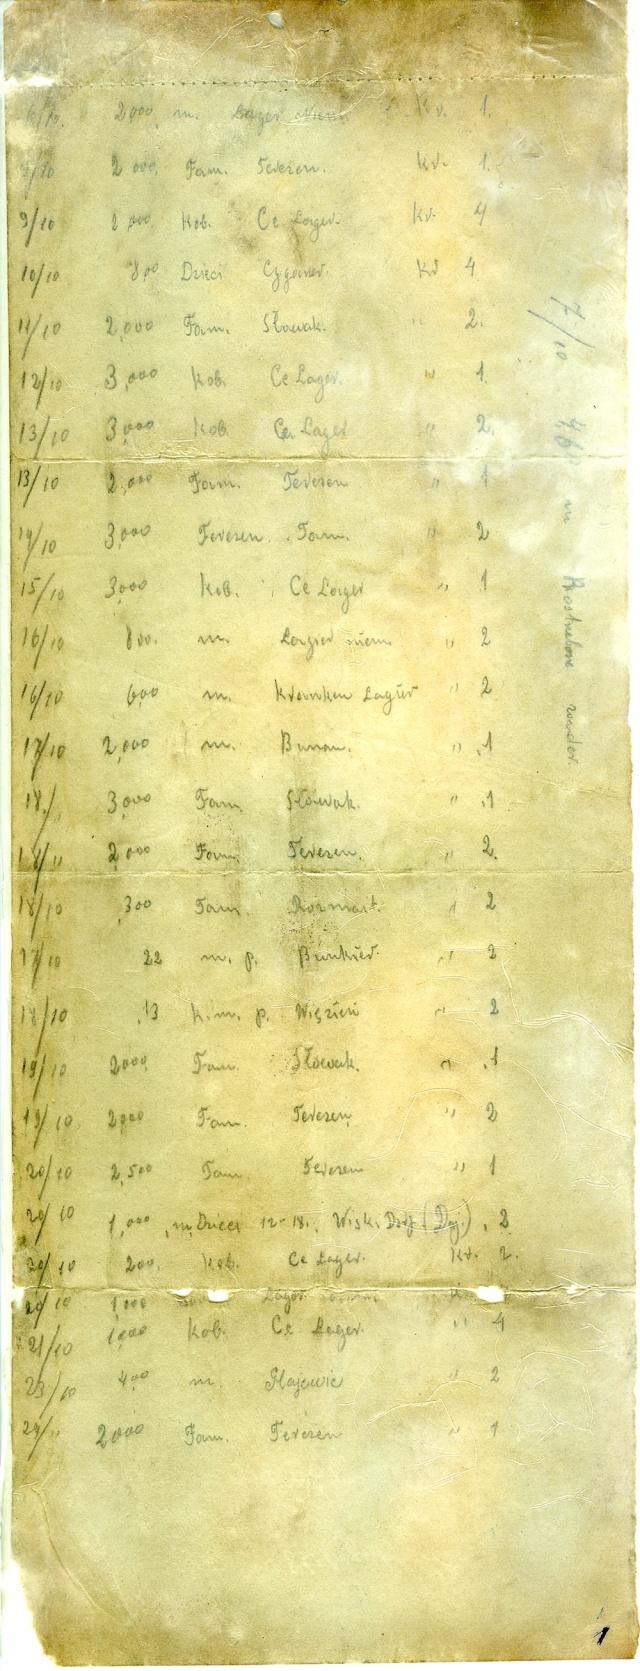 sonderkommando-list-1944